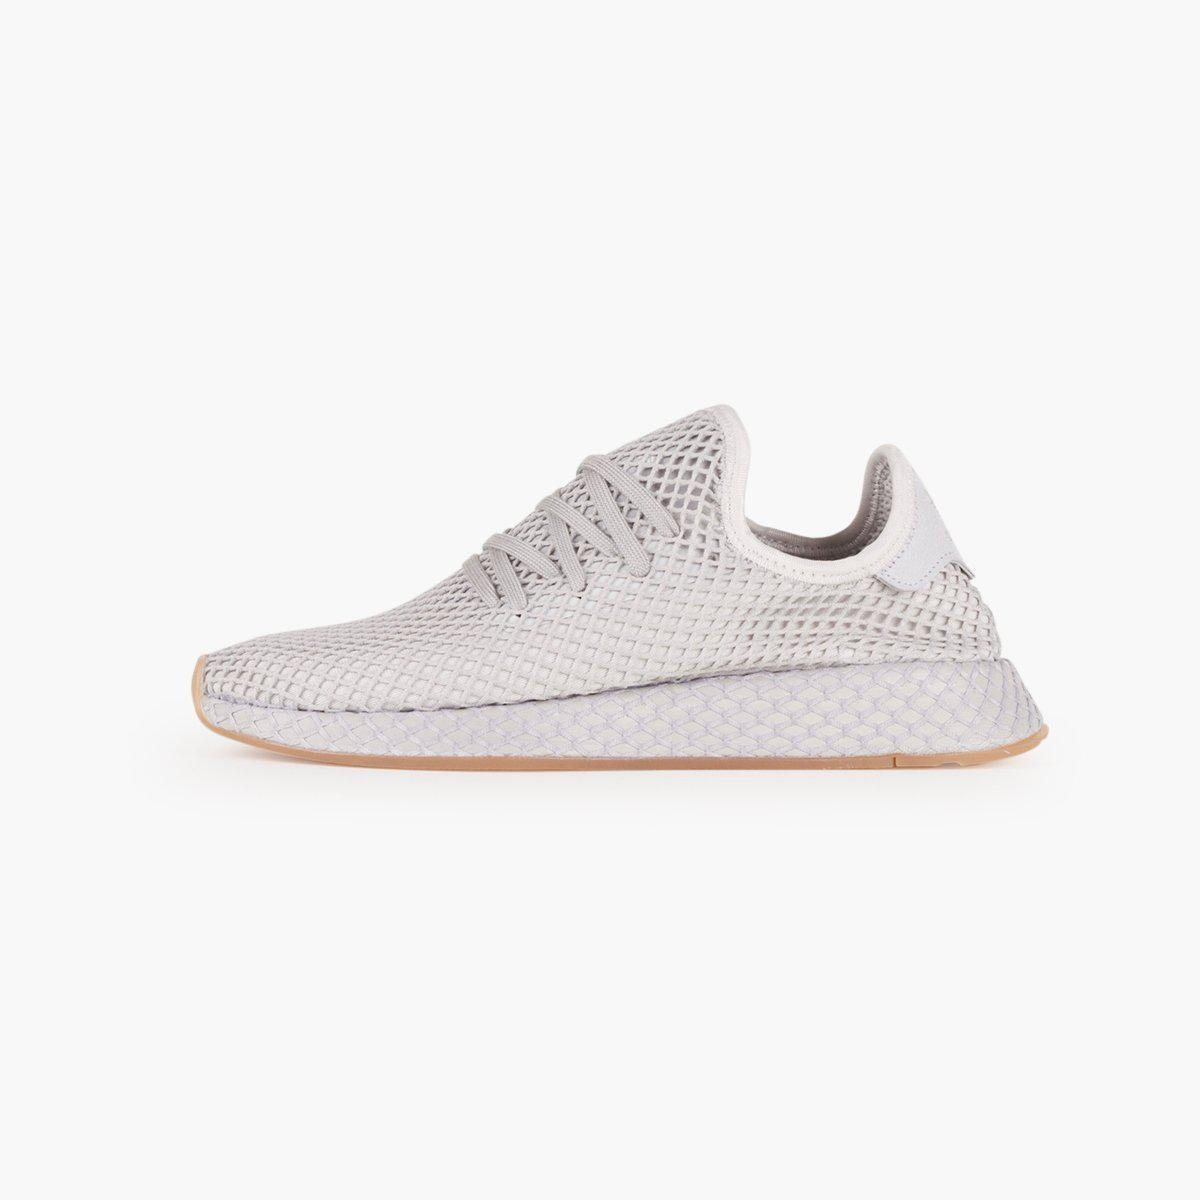 3c465ad7cd4 adidas Originals Deerupt Runner in White - Lyst